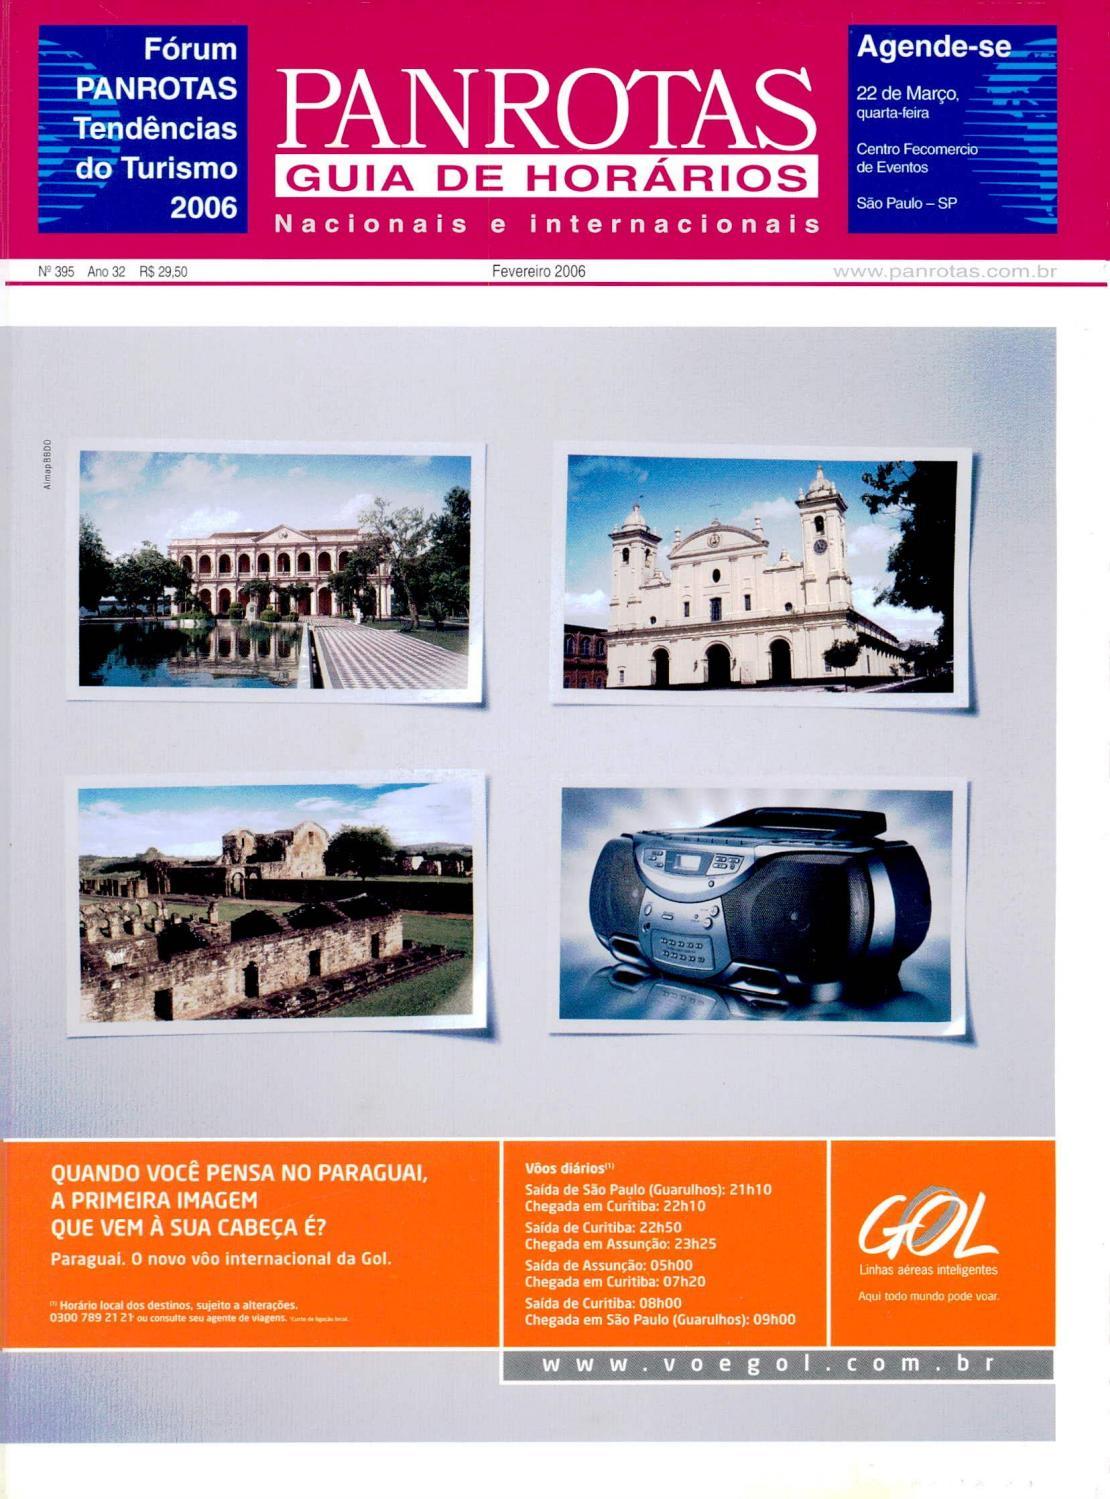 AGUIA BAIXAR DVD 2006 DE ASA